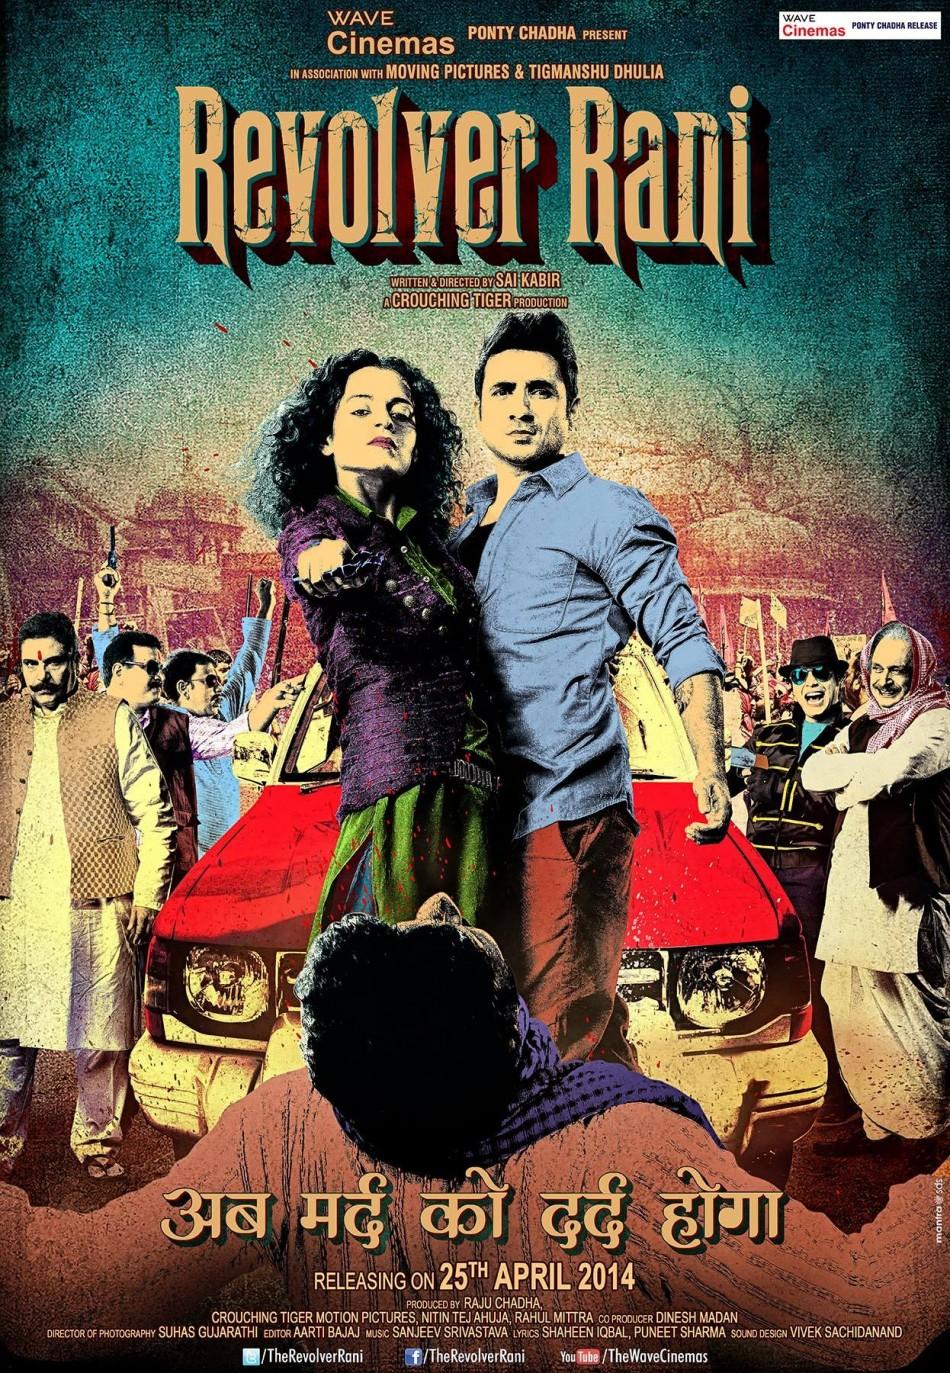 Piyush Mishra Revolver Rani' Review ...